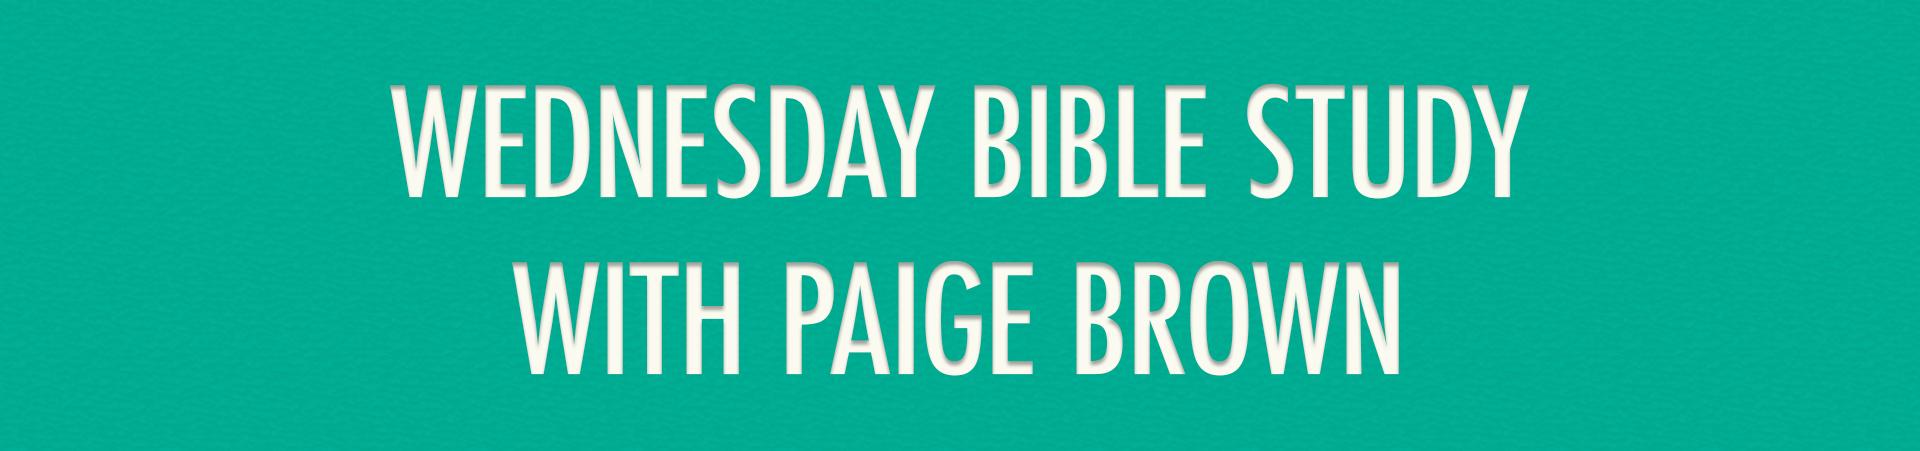 Paige2019FallEmailHeader.jpg